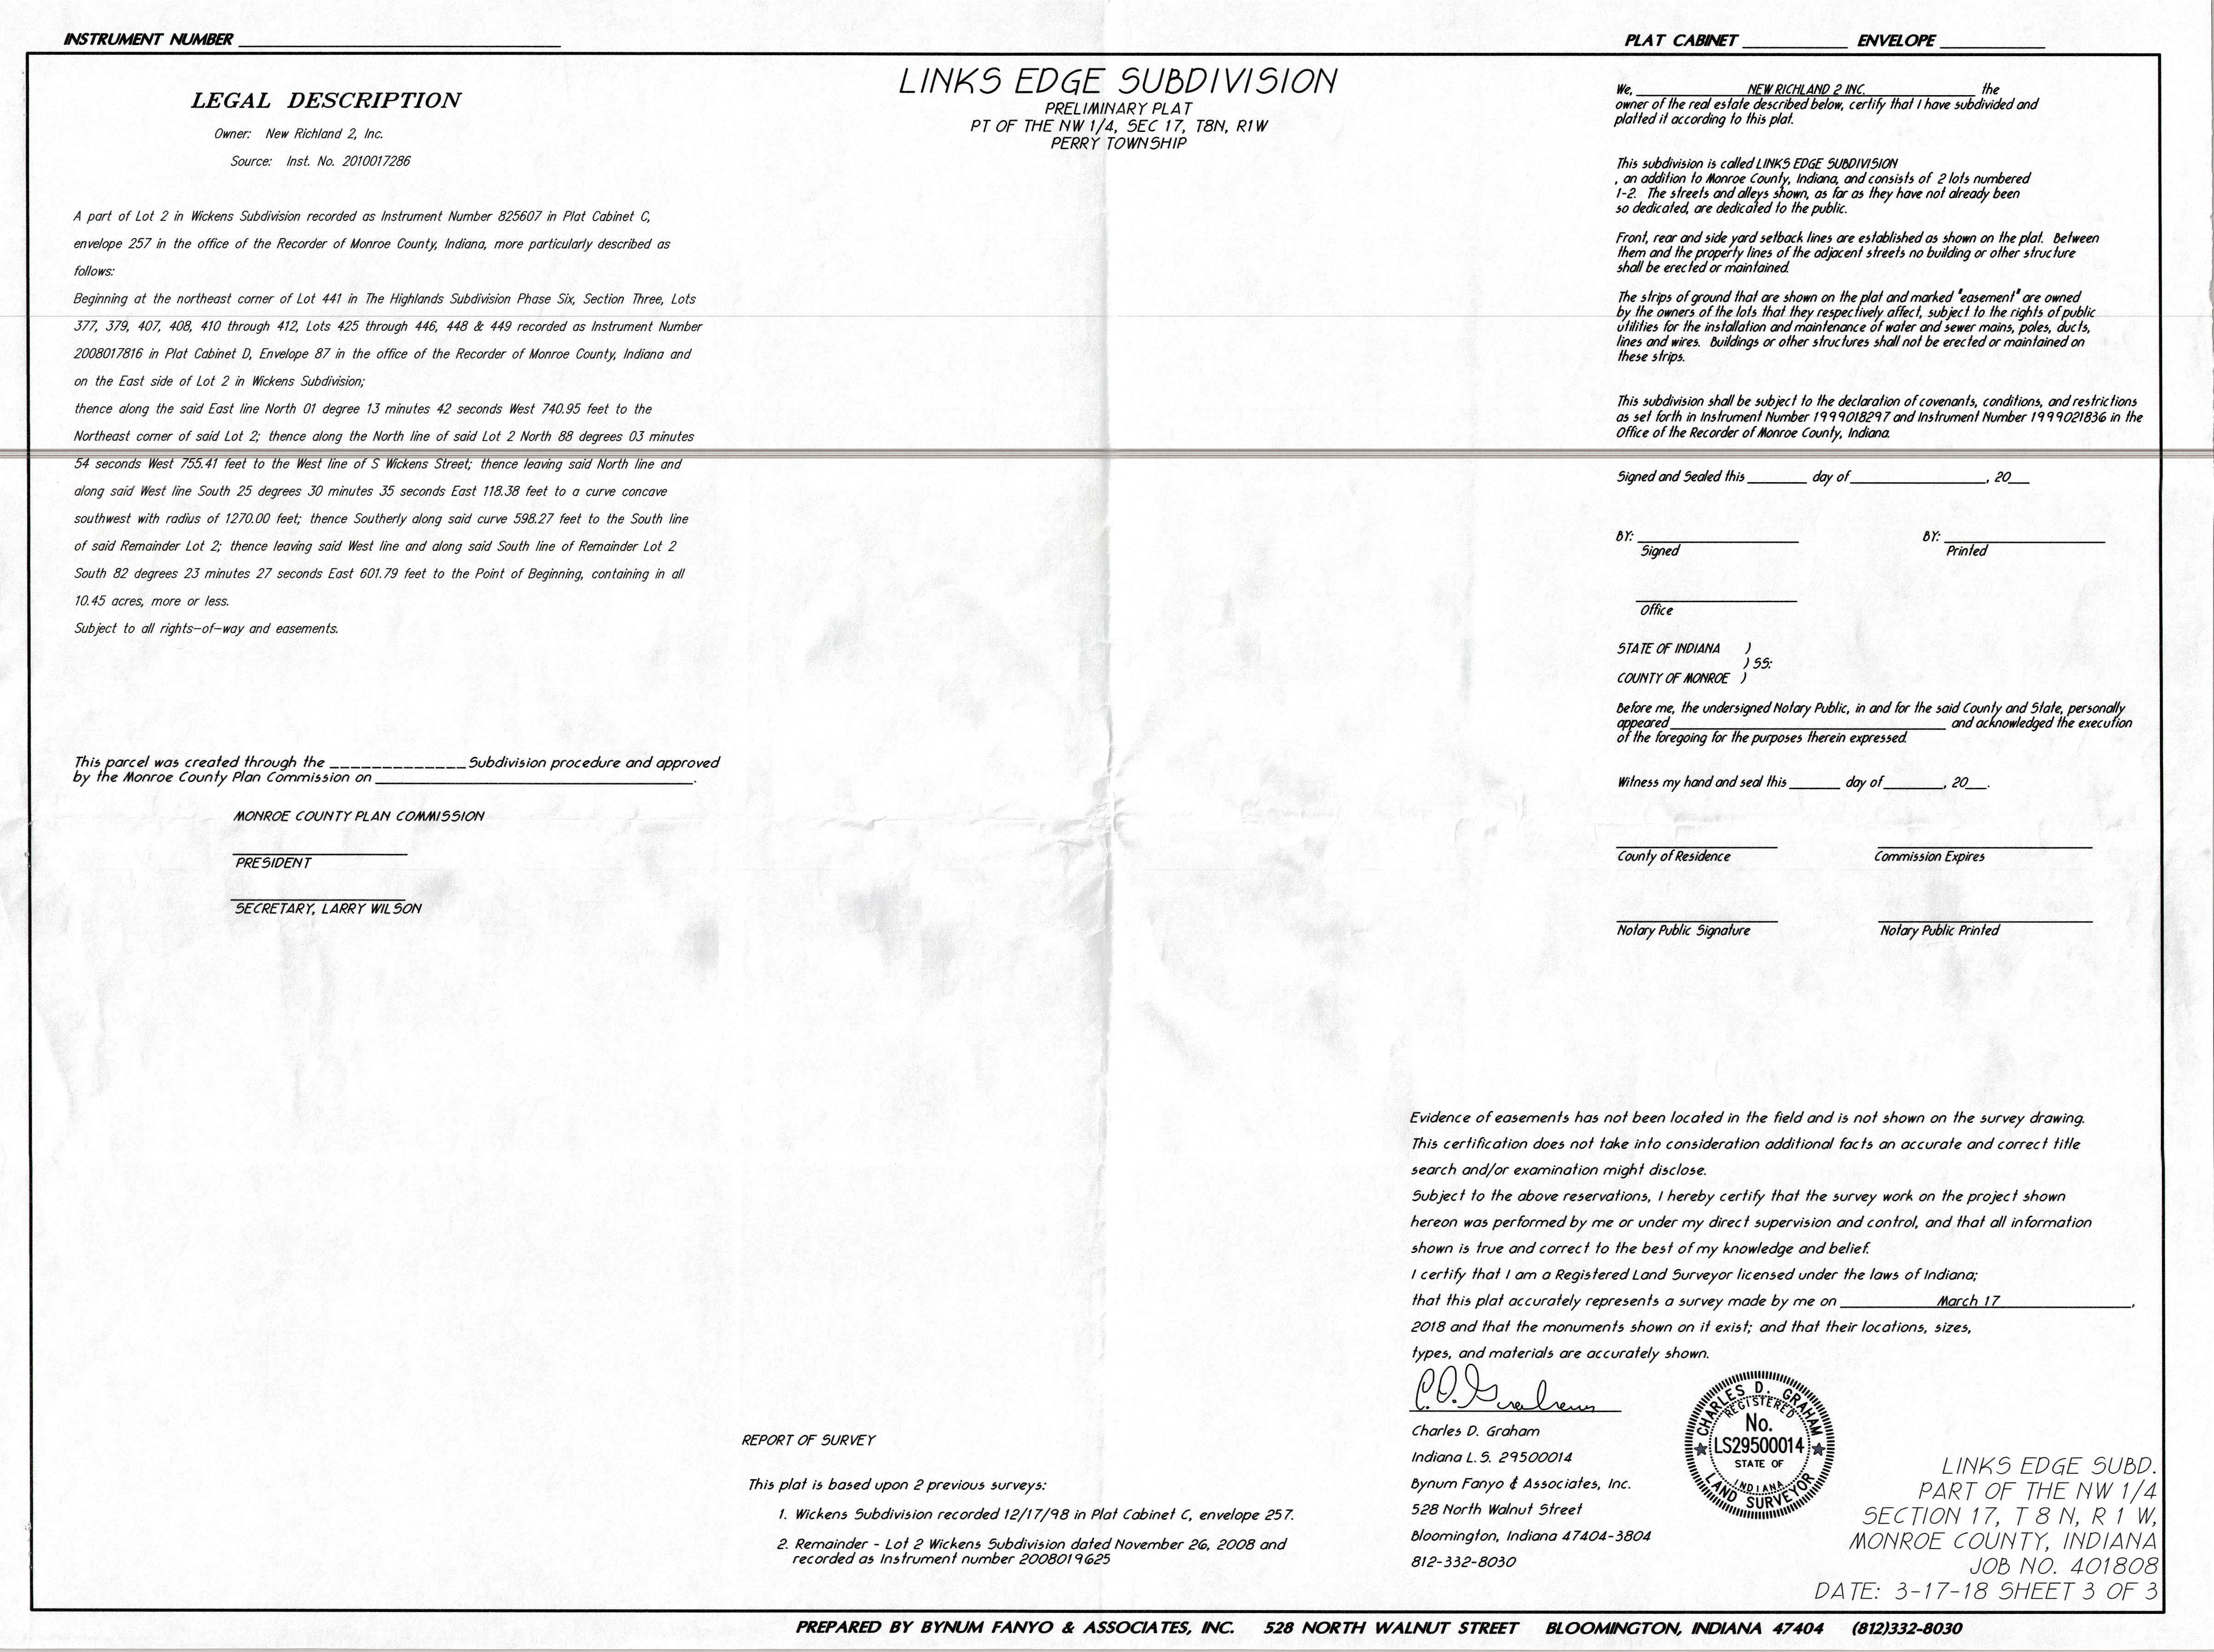 1803-SPP-01_Highlands Parcel 'E' - Preliminary Plat Page 3